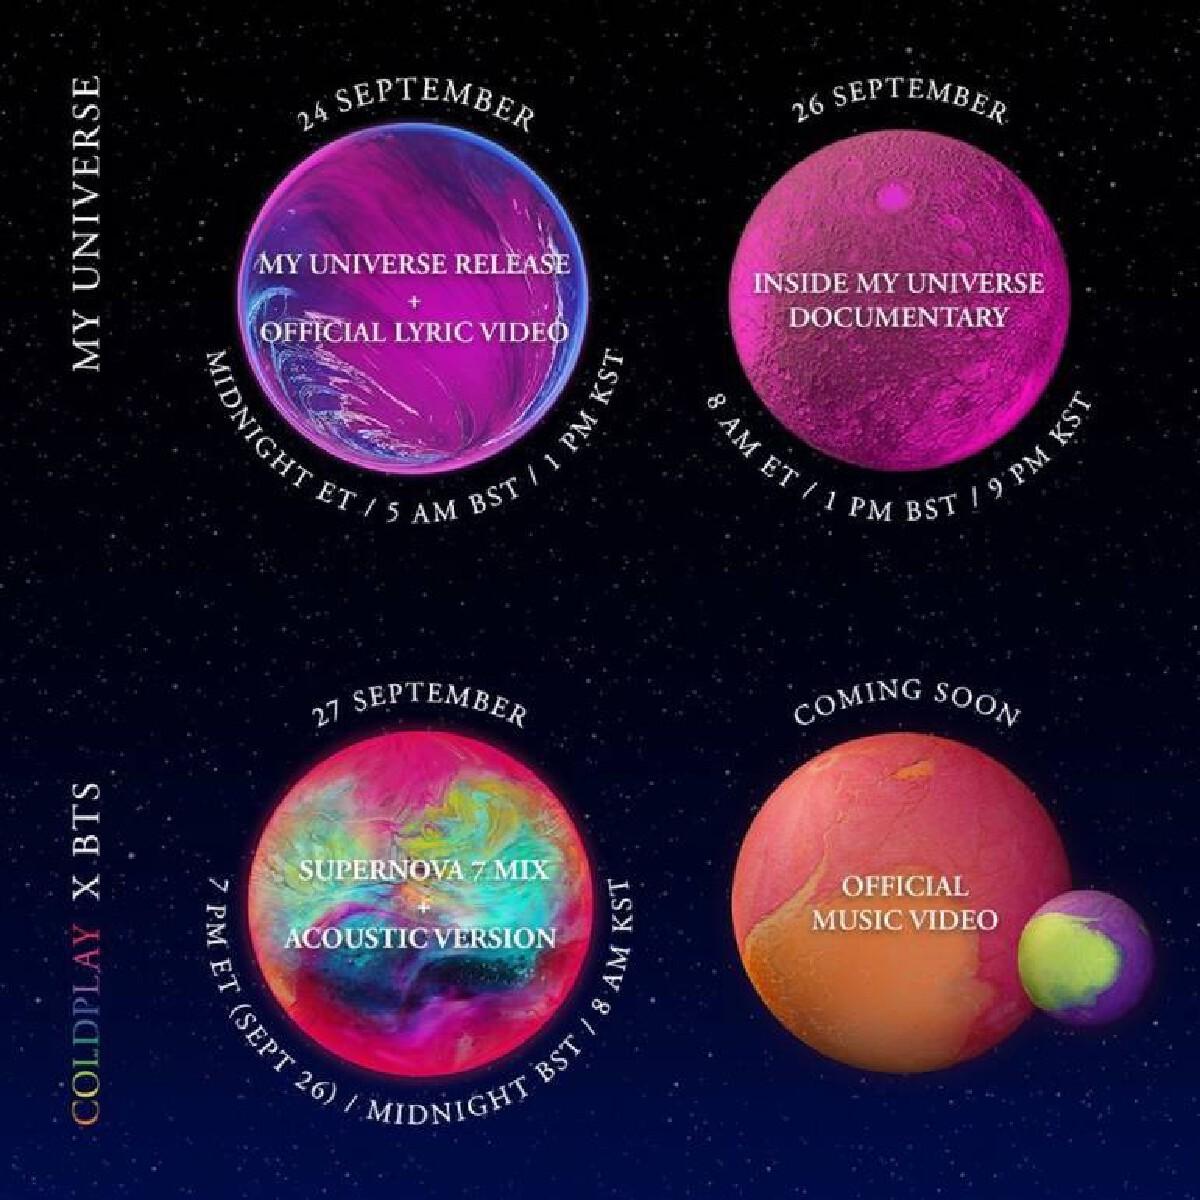 """Coldplay - BTS"" ปล่อยเพลงใหม่ My Universe การ Collaboration ระดับโลก"